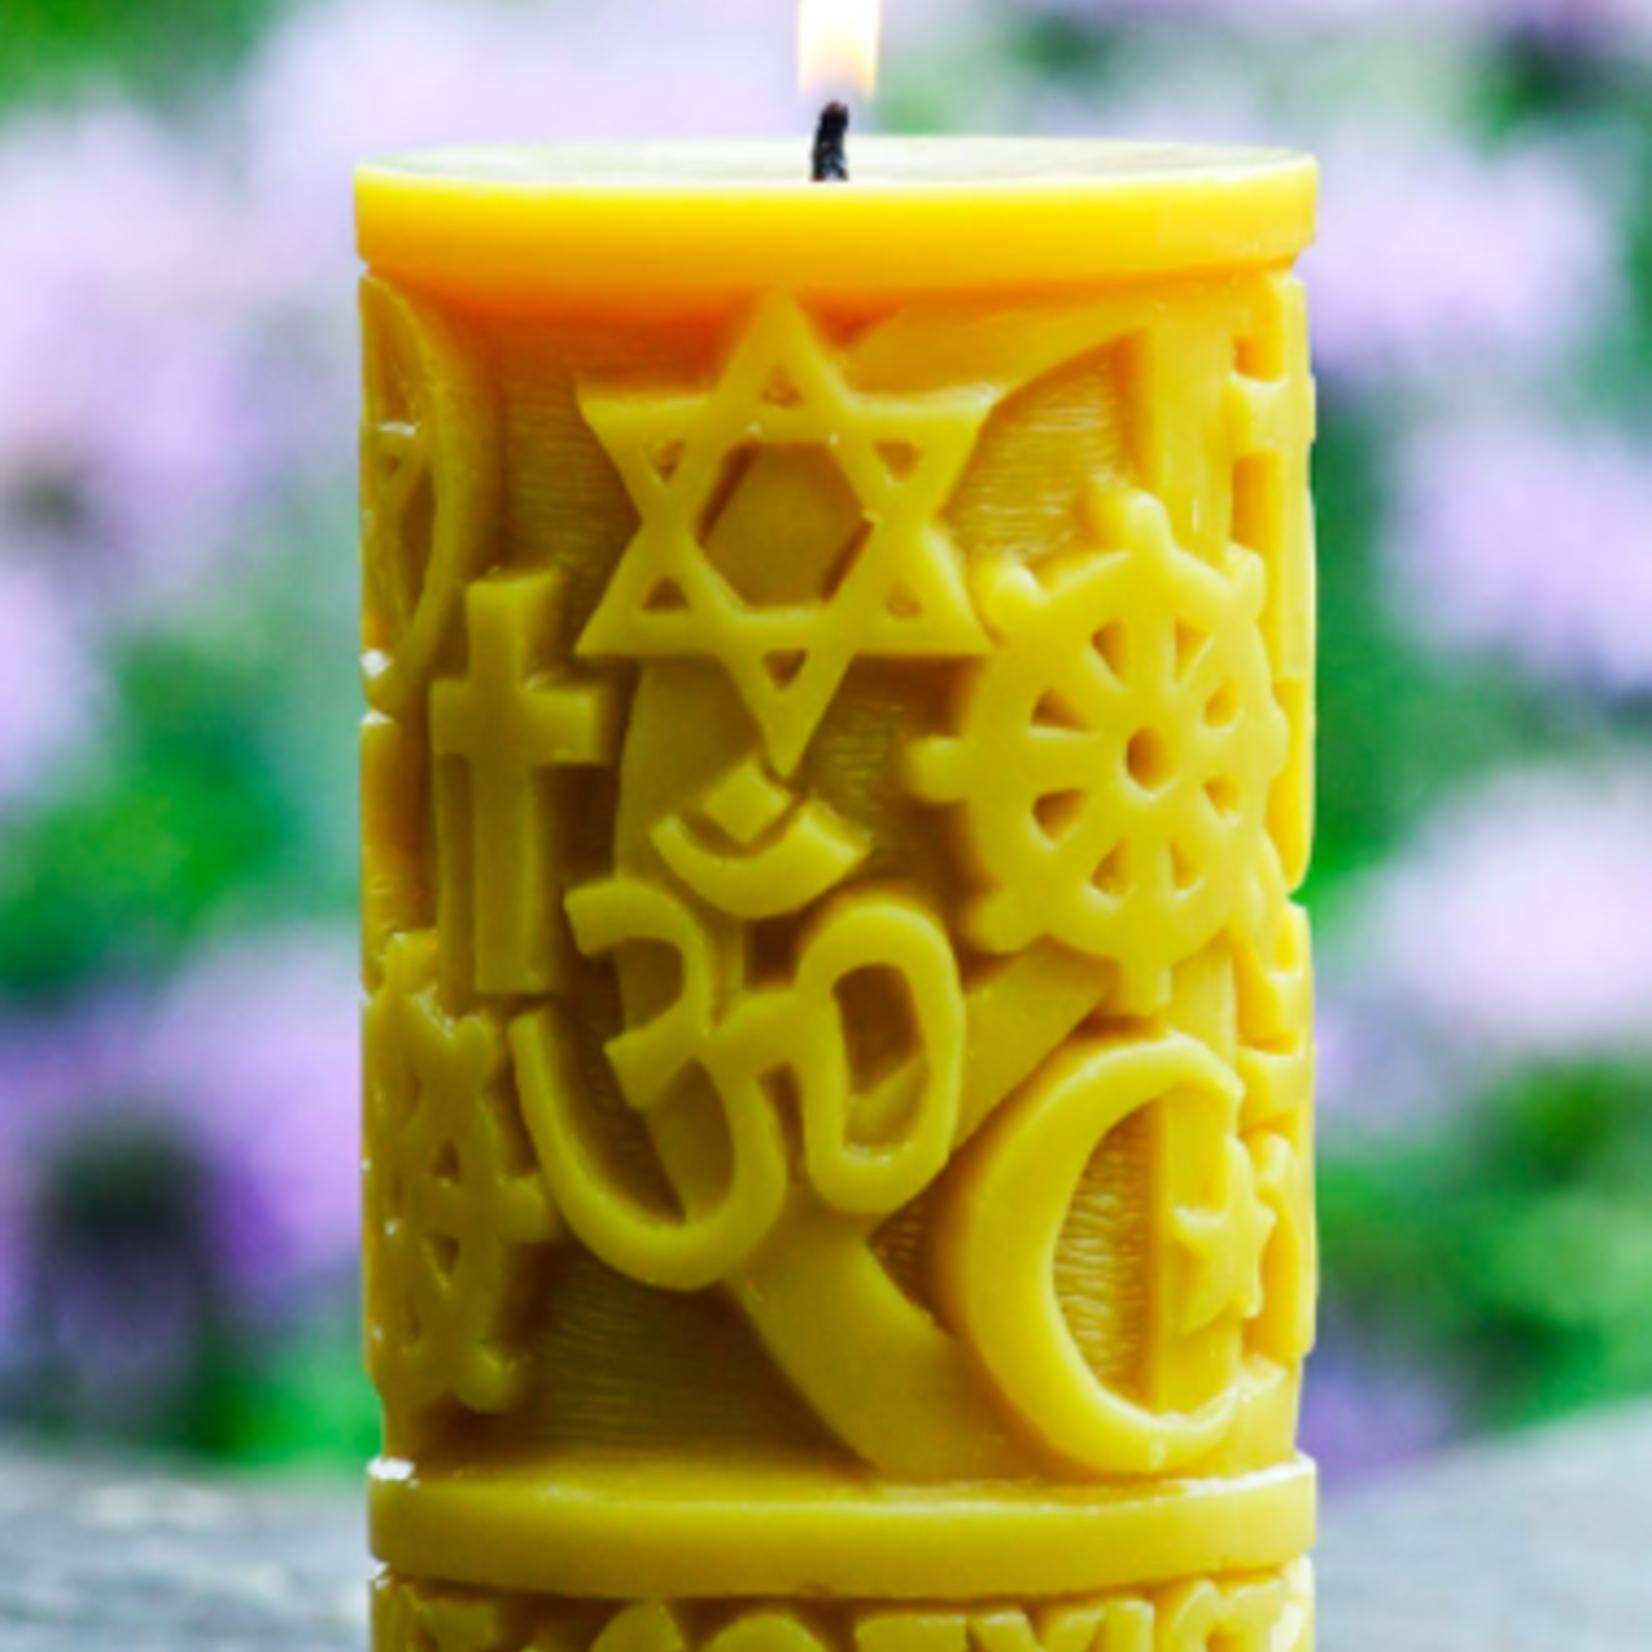 Sunbeam Coexist in Peace Candle